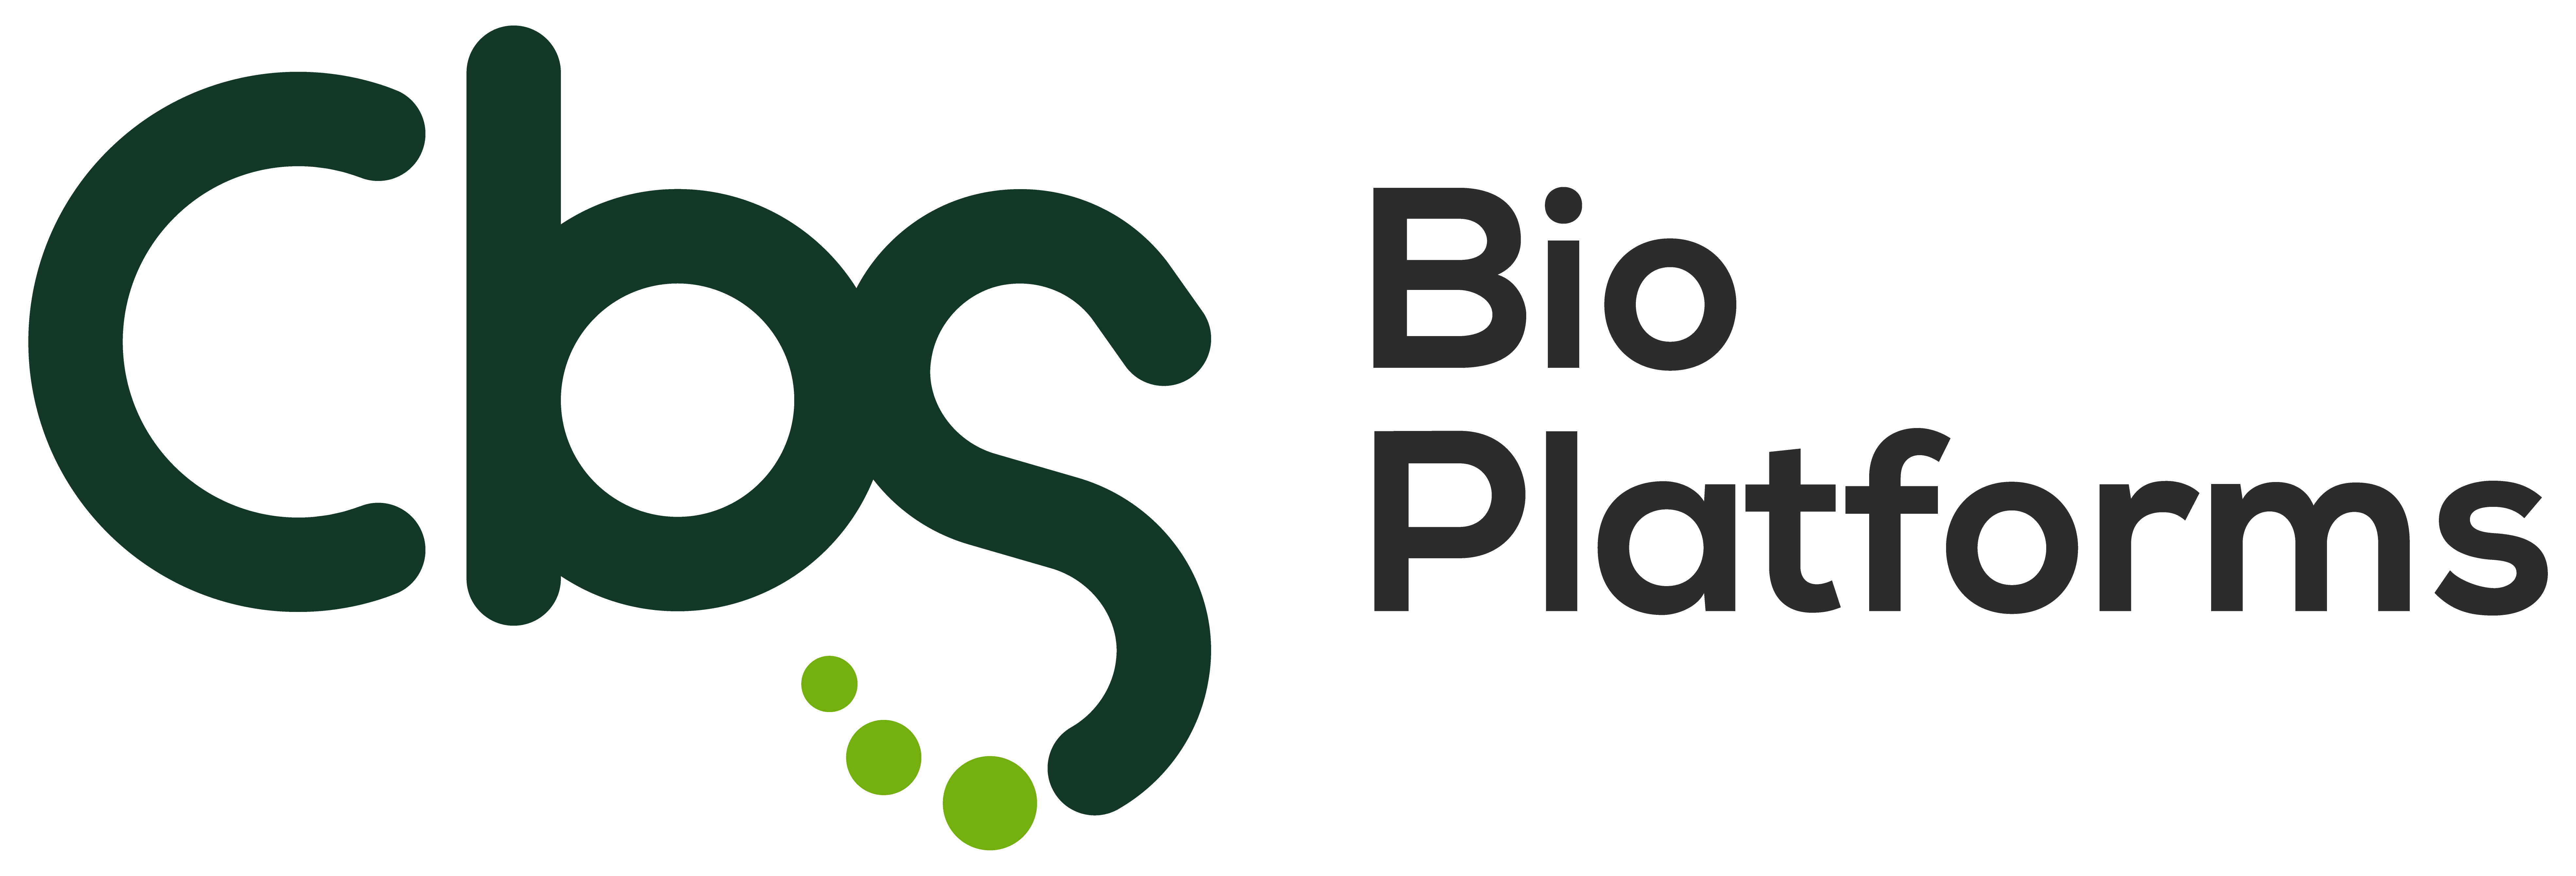 New_CBS_Logo